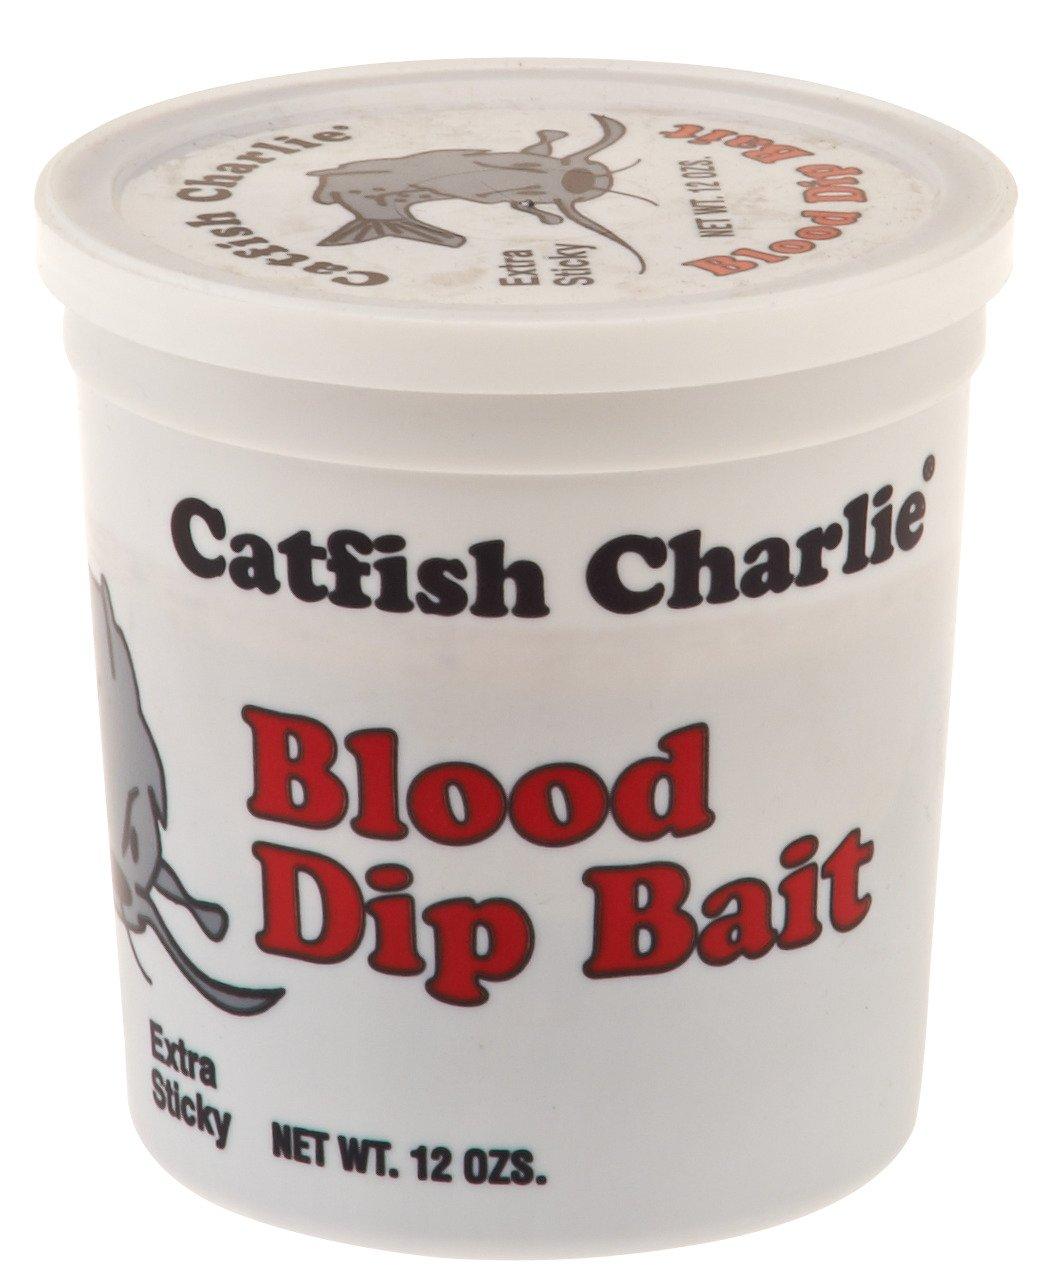 Catfish Charlie 12 oz. Blood-Flavored Dip Bait